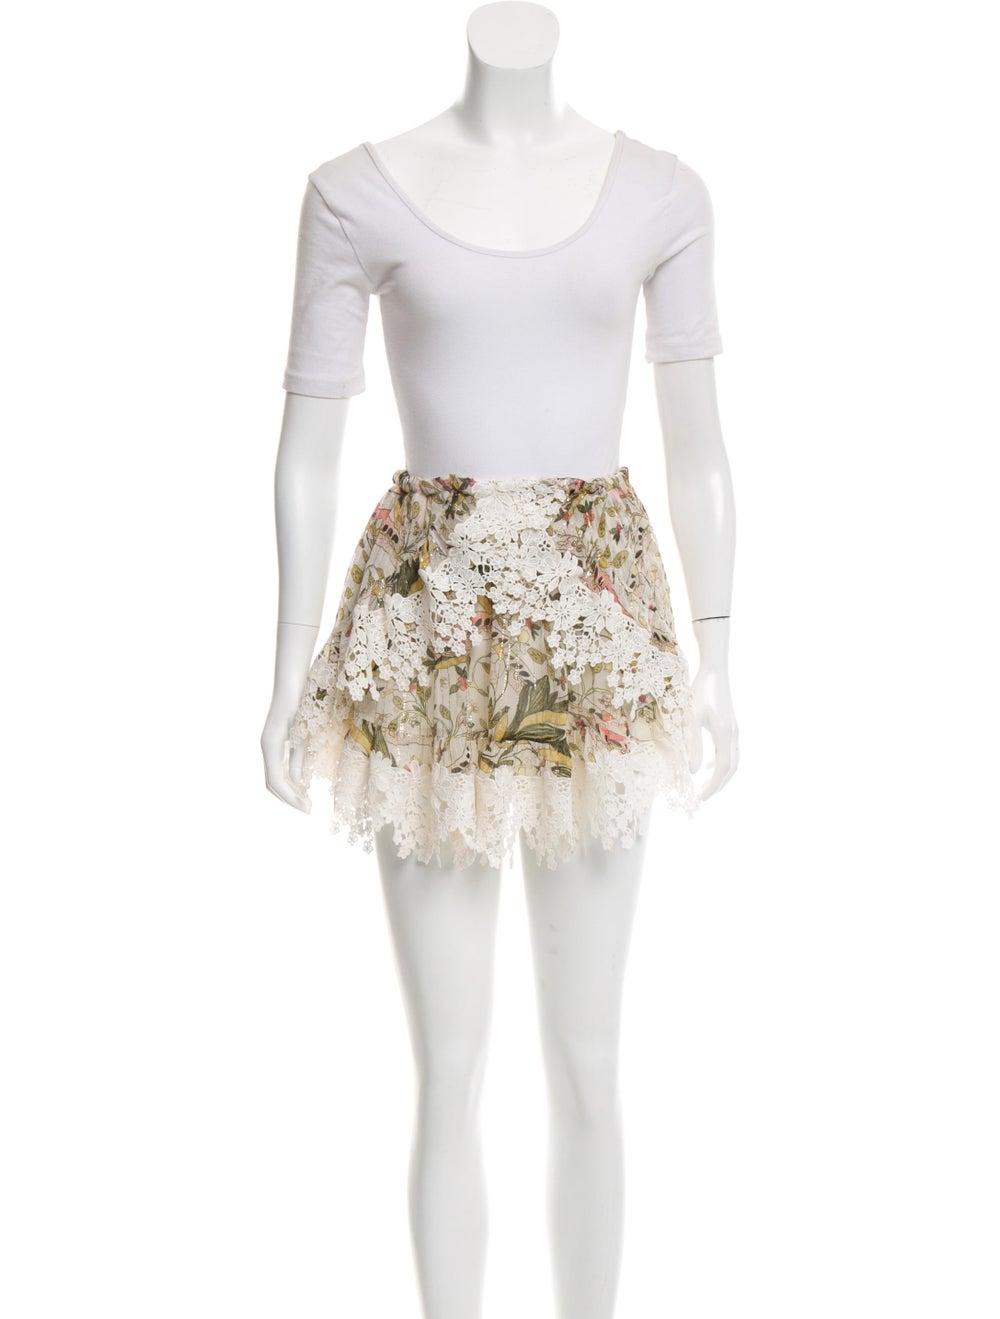 Zimmermann Floral Print Skirt Set - image 4